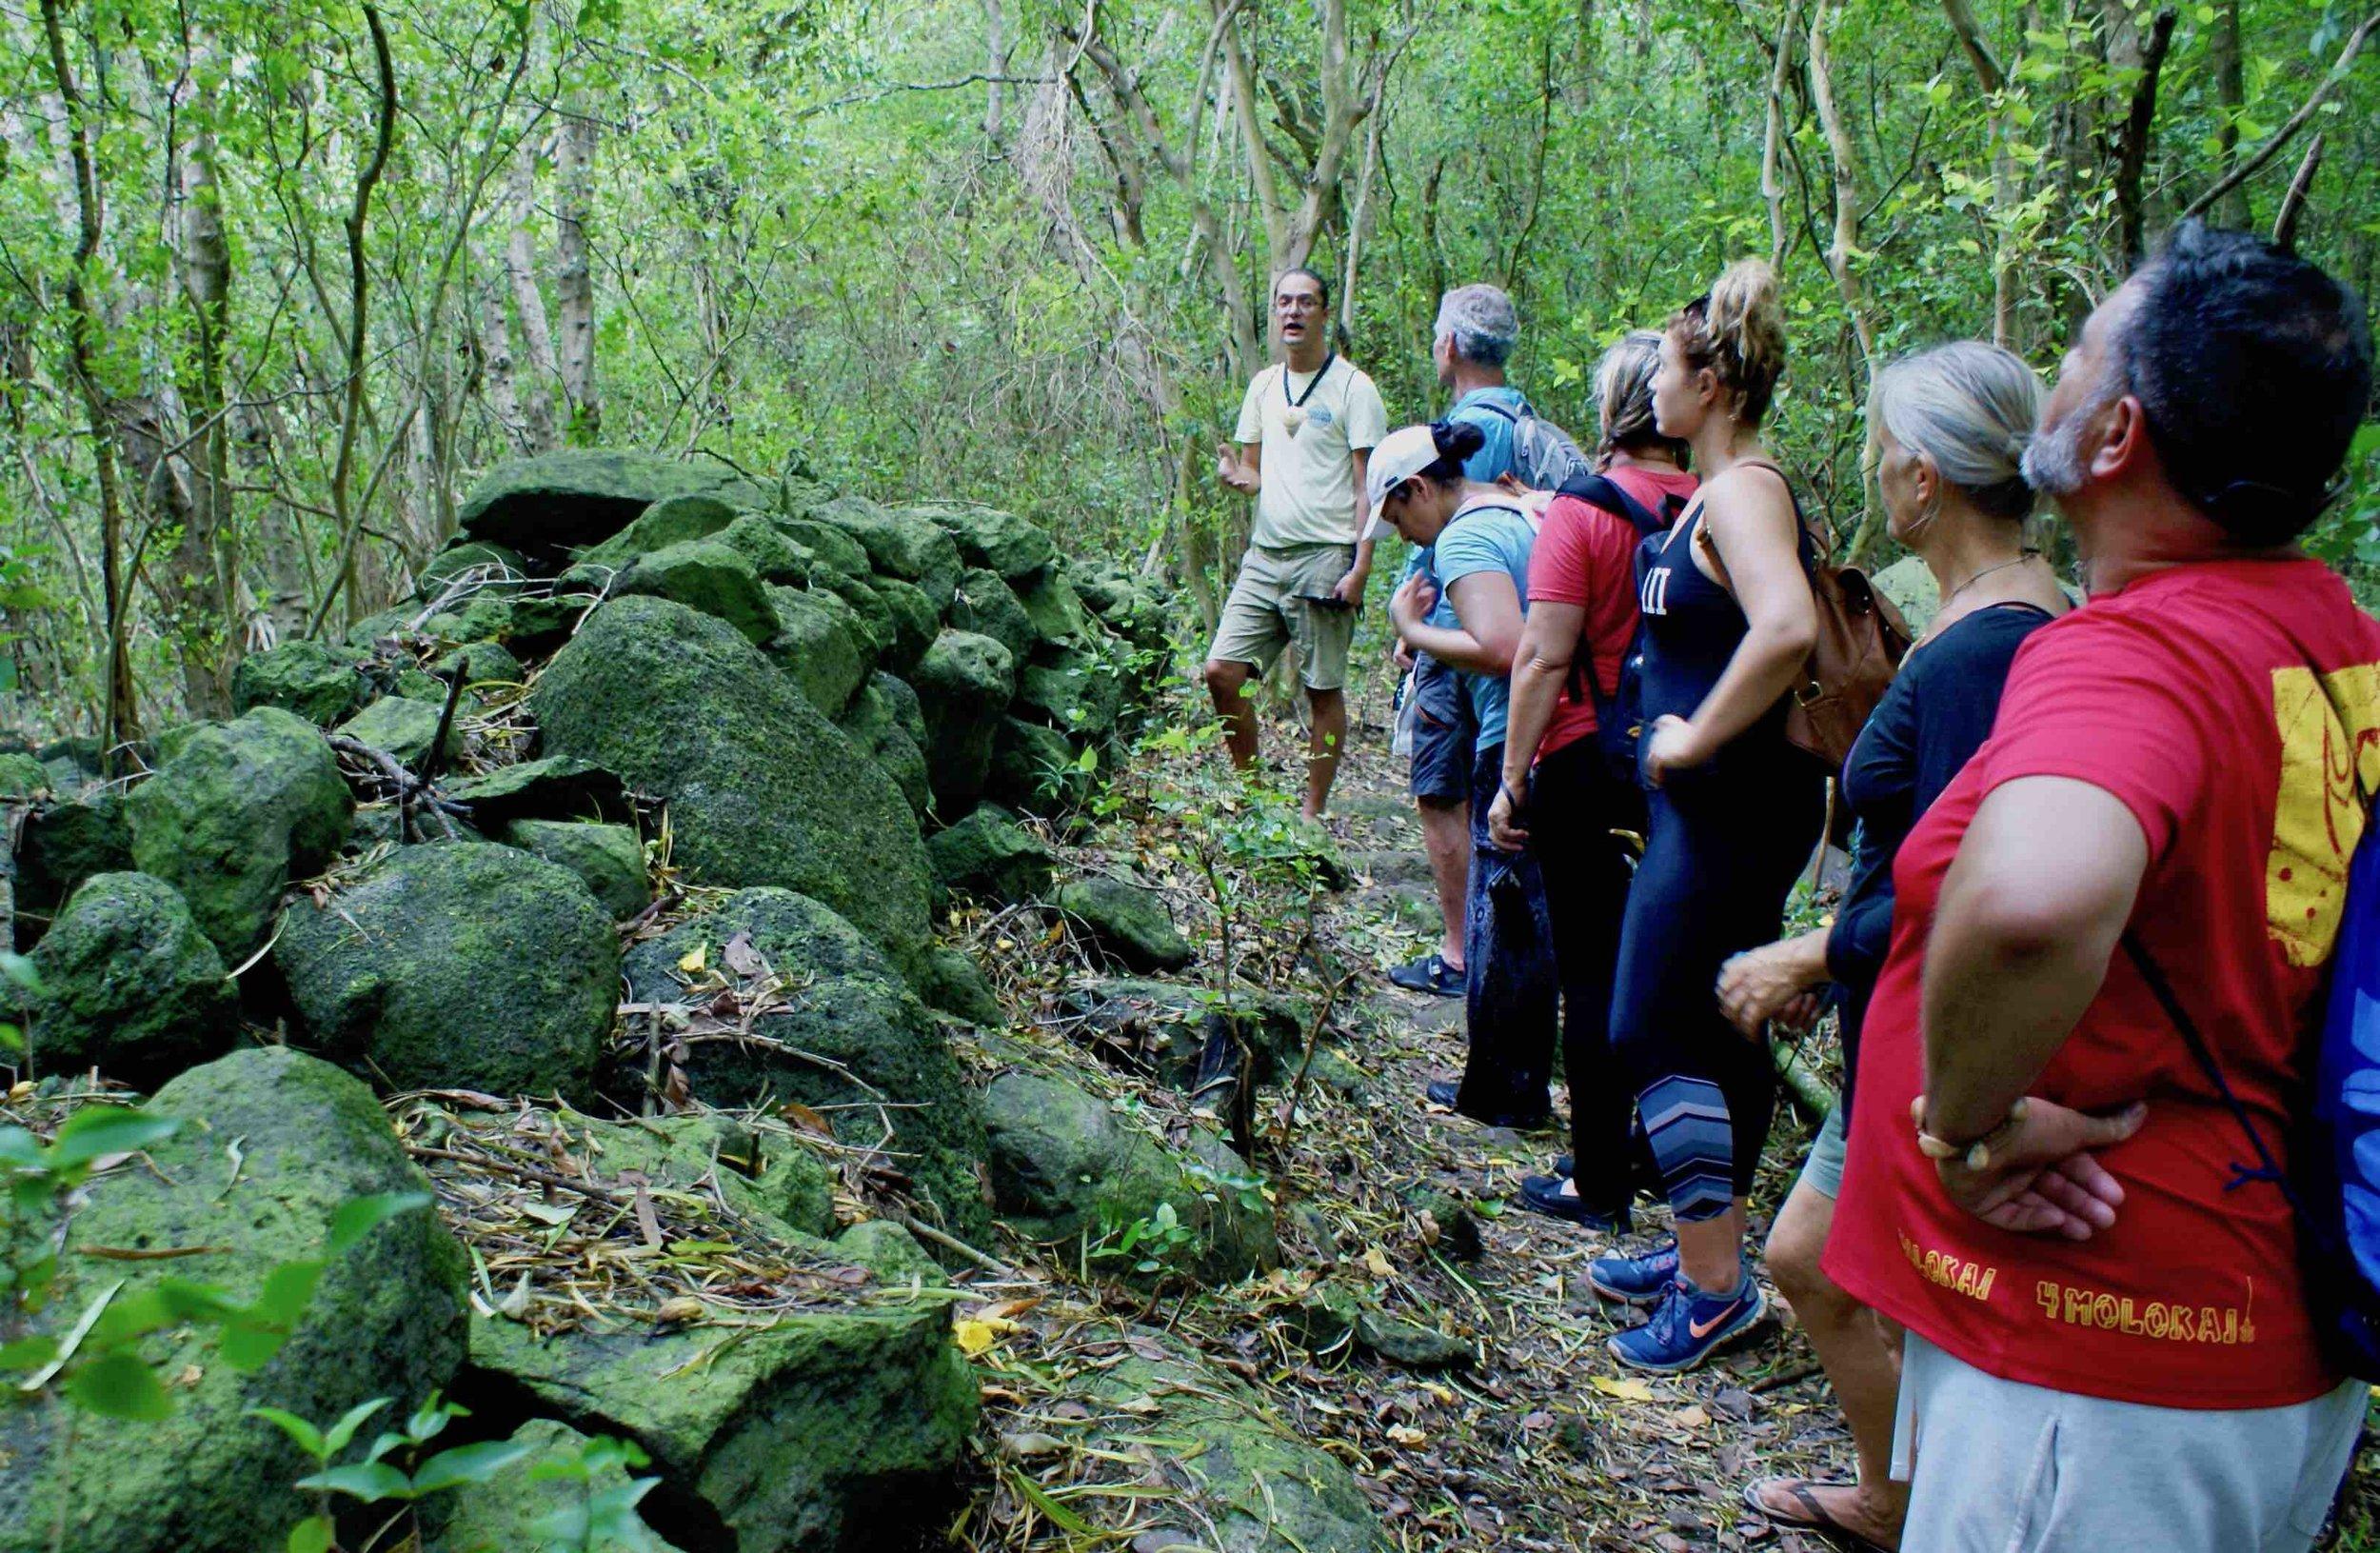 wall halawa valley archeology kumu kawika foster.jpg